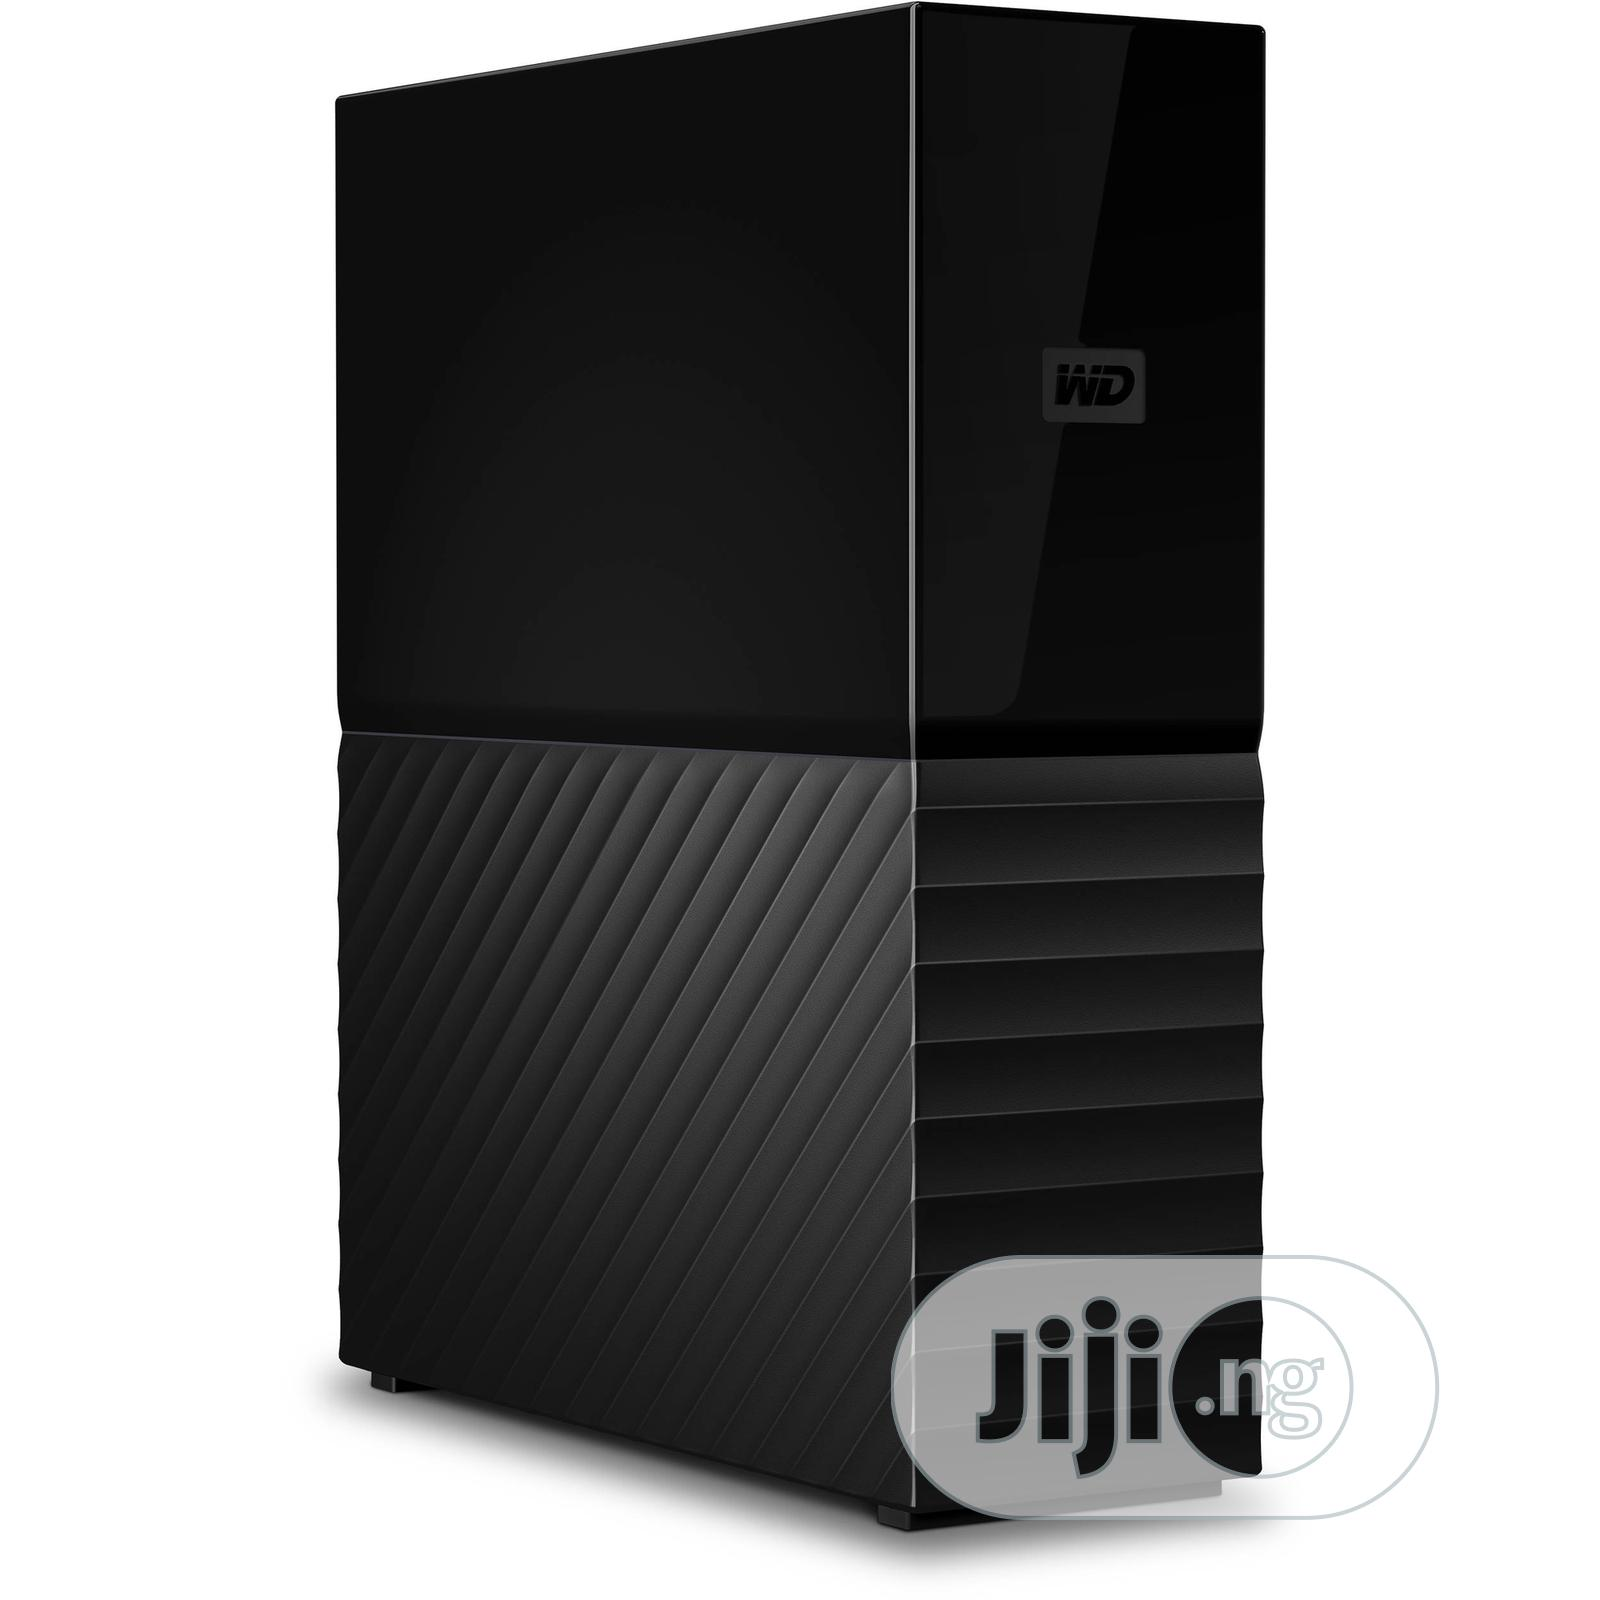 8TB My Book Desktop USB 3.0 External Hard Drive